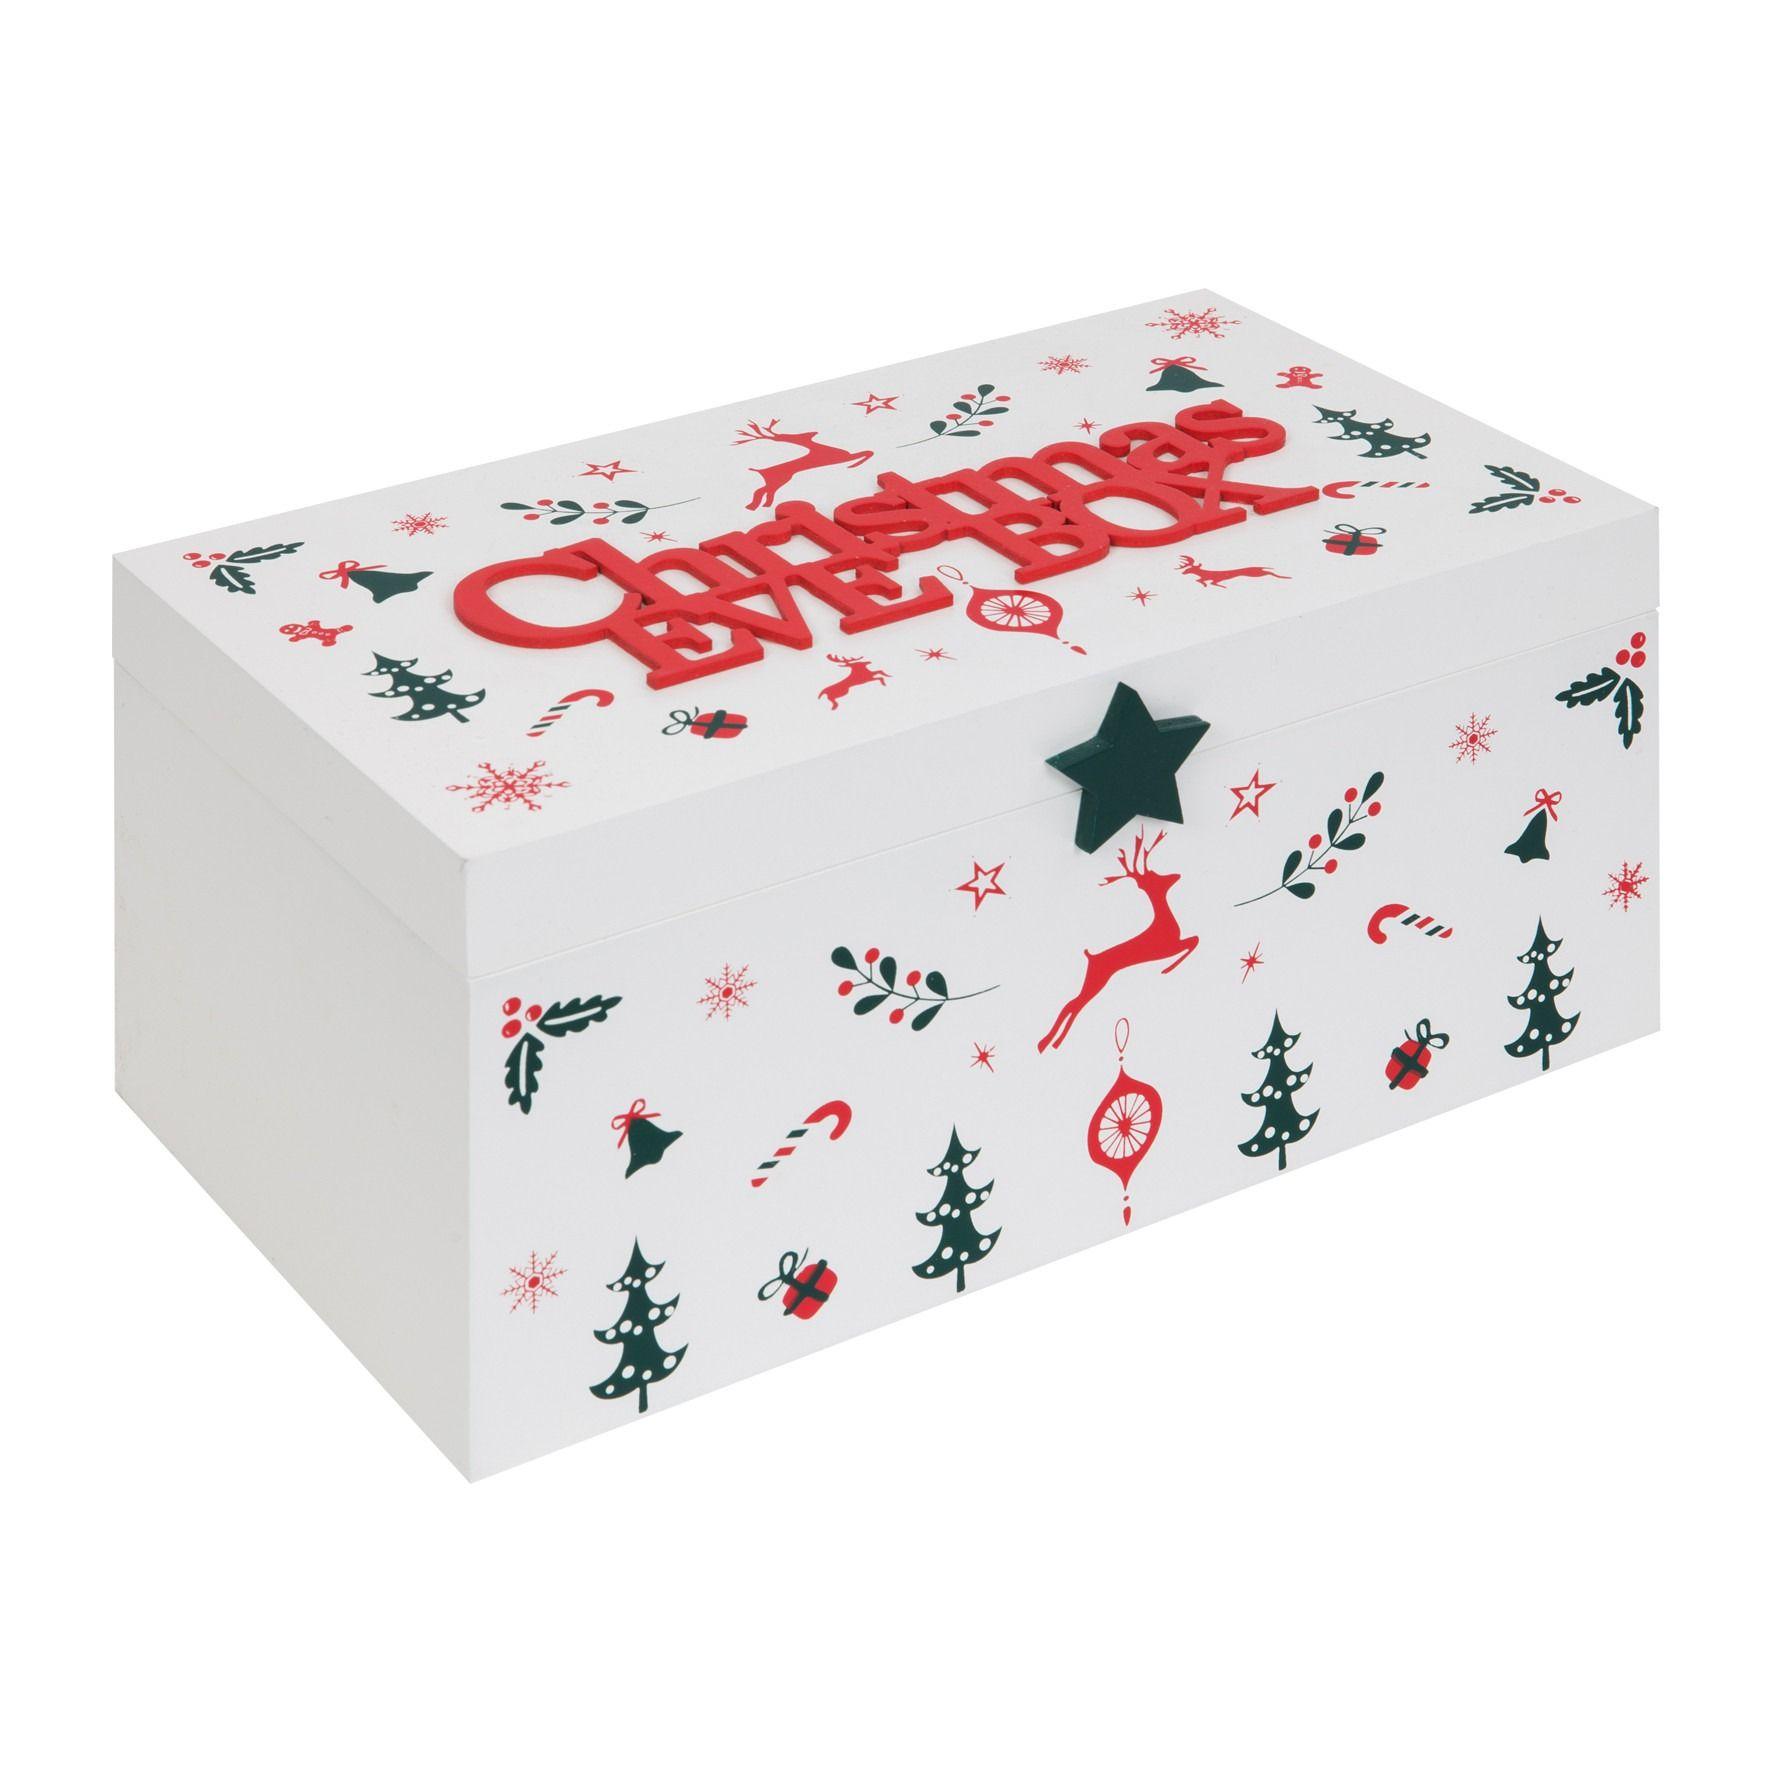 White Christmas Eve Box